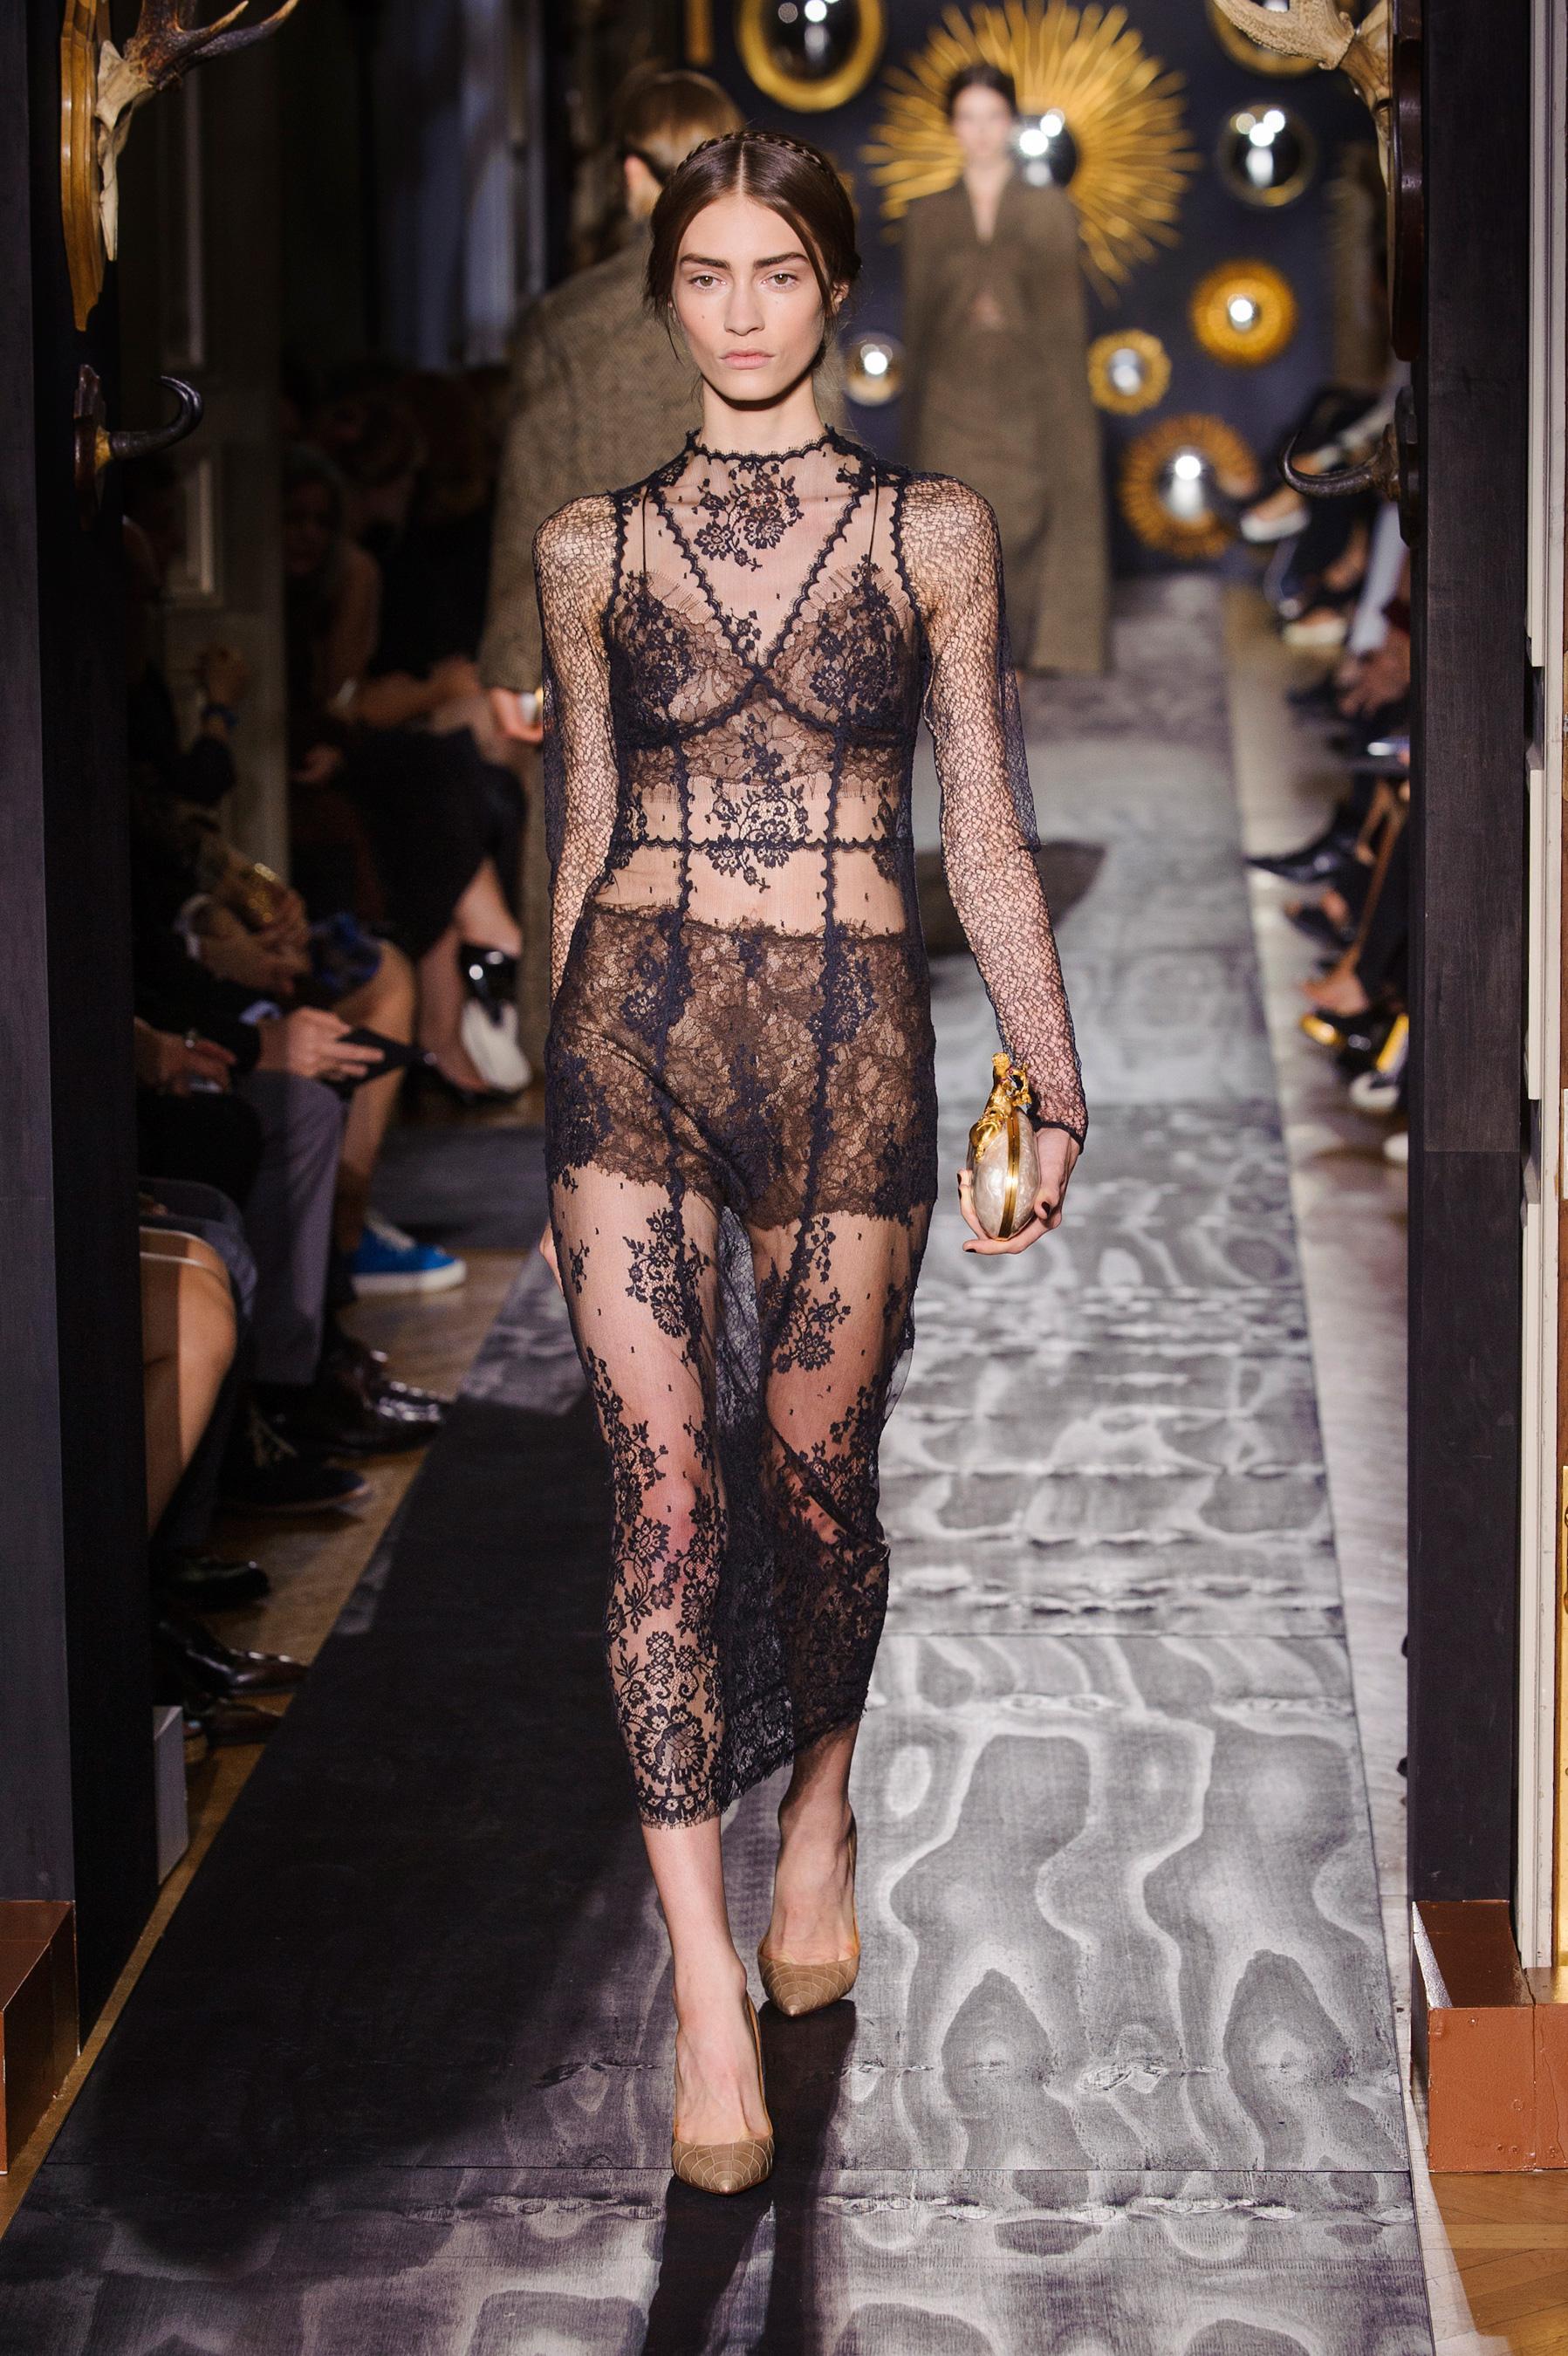 d fil valentino automne hiver 2013 2014 haute couture le figaro madame. Black Bedroom Furniture Sets. Home Design Ideas